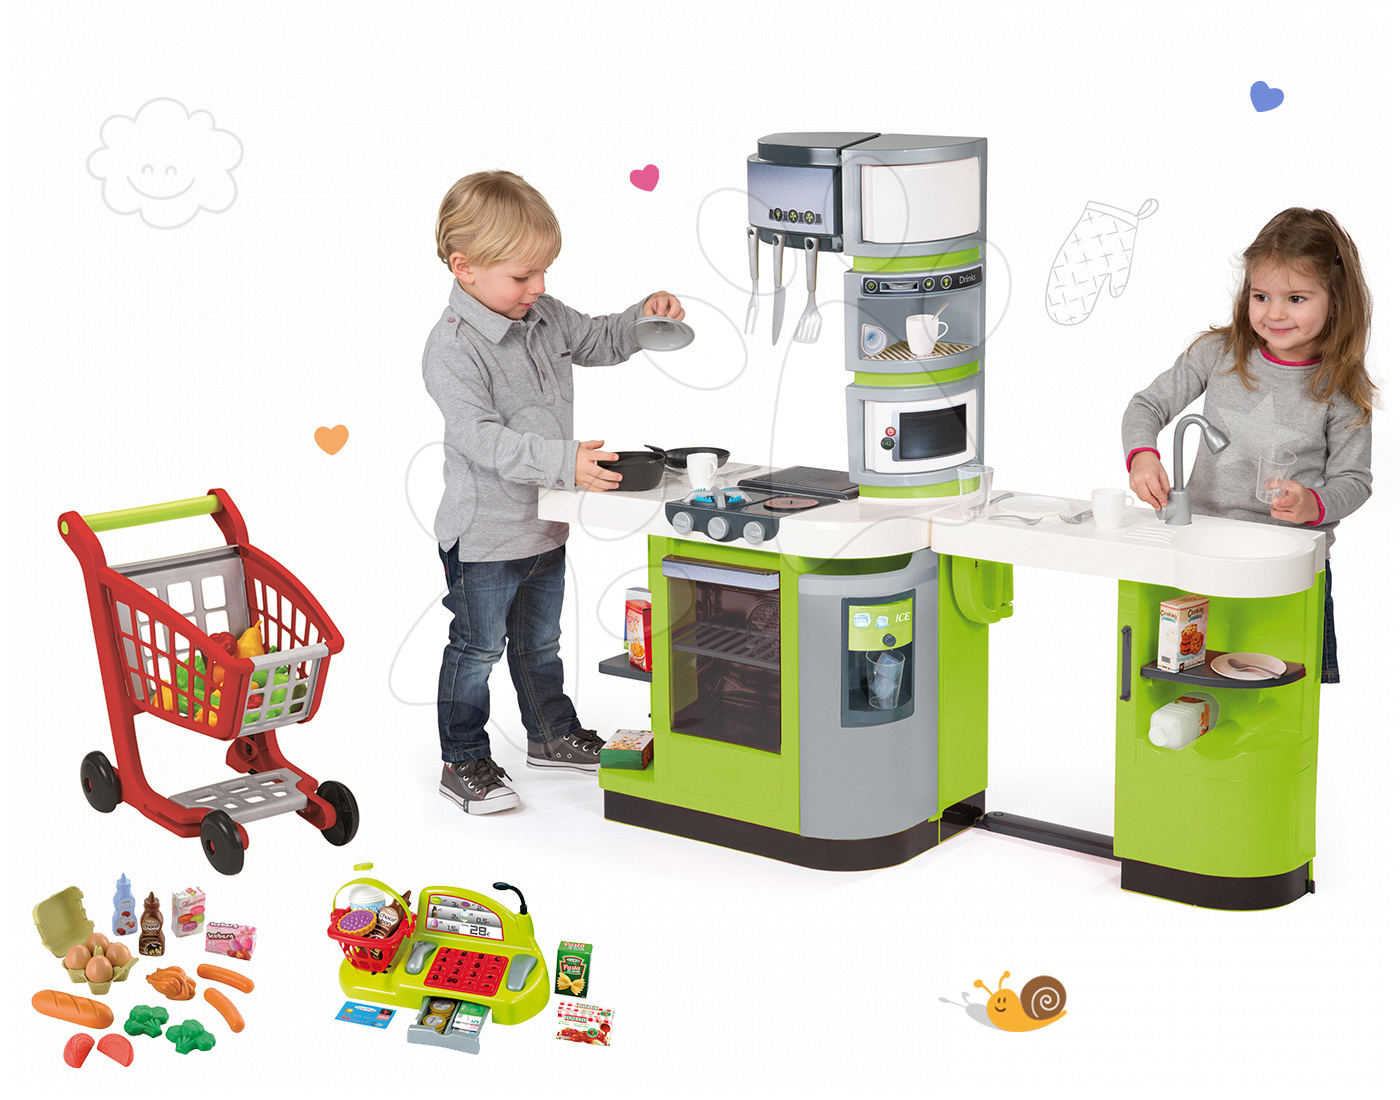 Smoby set kuchynka CookMaster Verte, Écoiffier pokladňa, nákupný košík, potraviny 311102-25